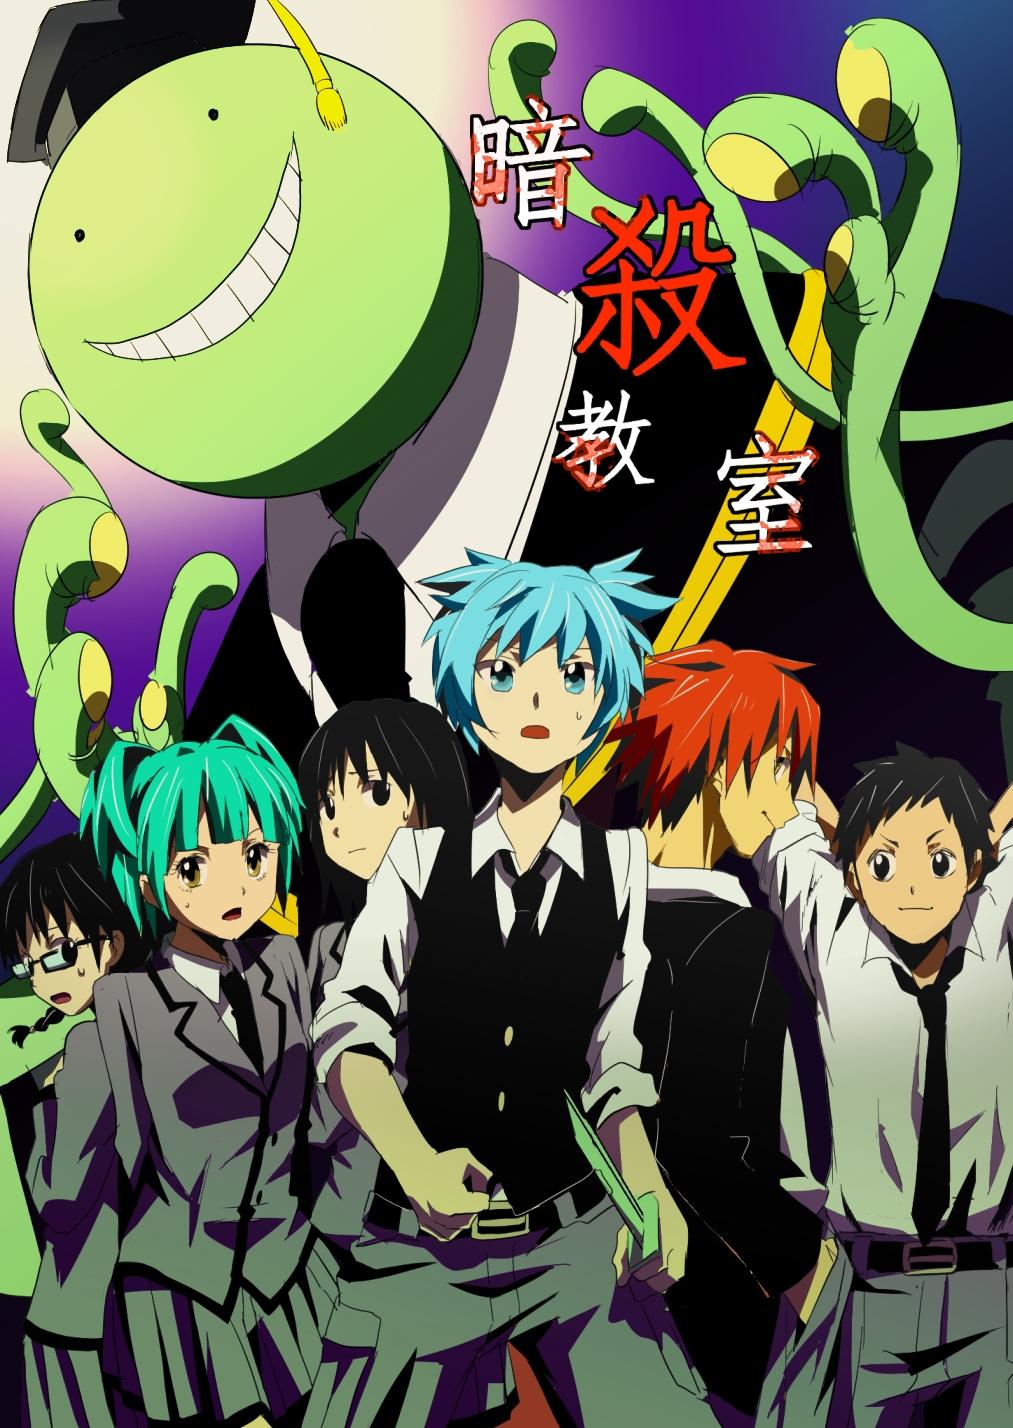 Assassination Classroom | Anime Voice-Over Wiki | FANDOM